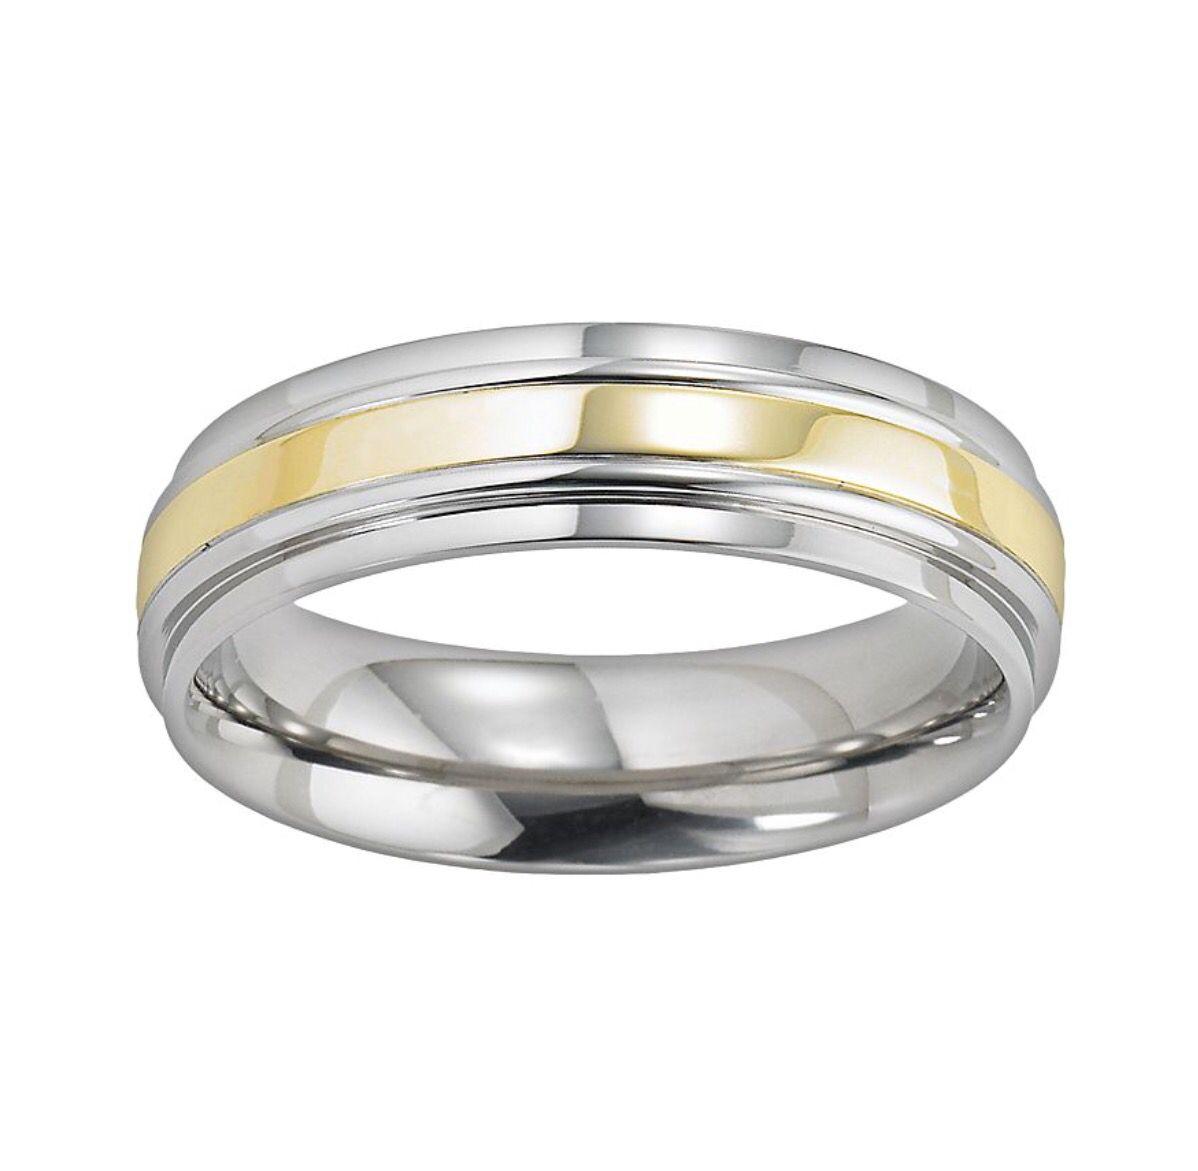 Pin by 🔆ALLISON🔆 on ♥PARIS WEDDING!♥ | Pinterest | Wedding